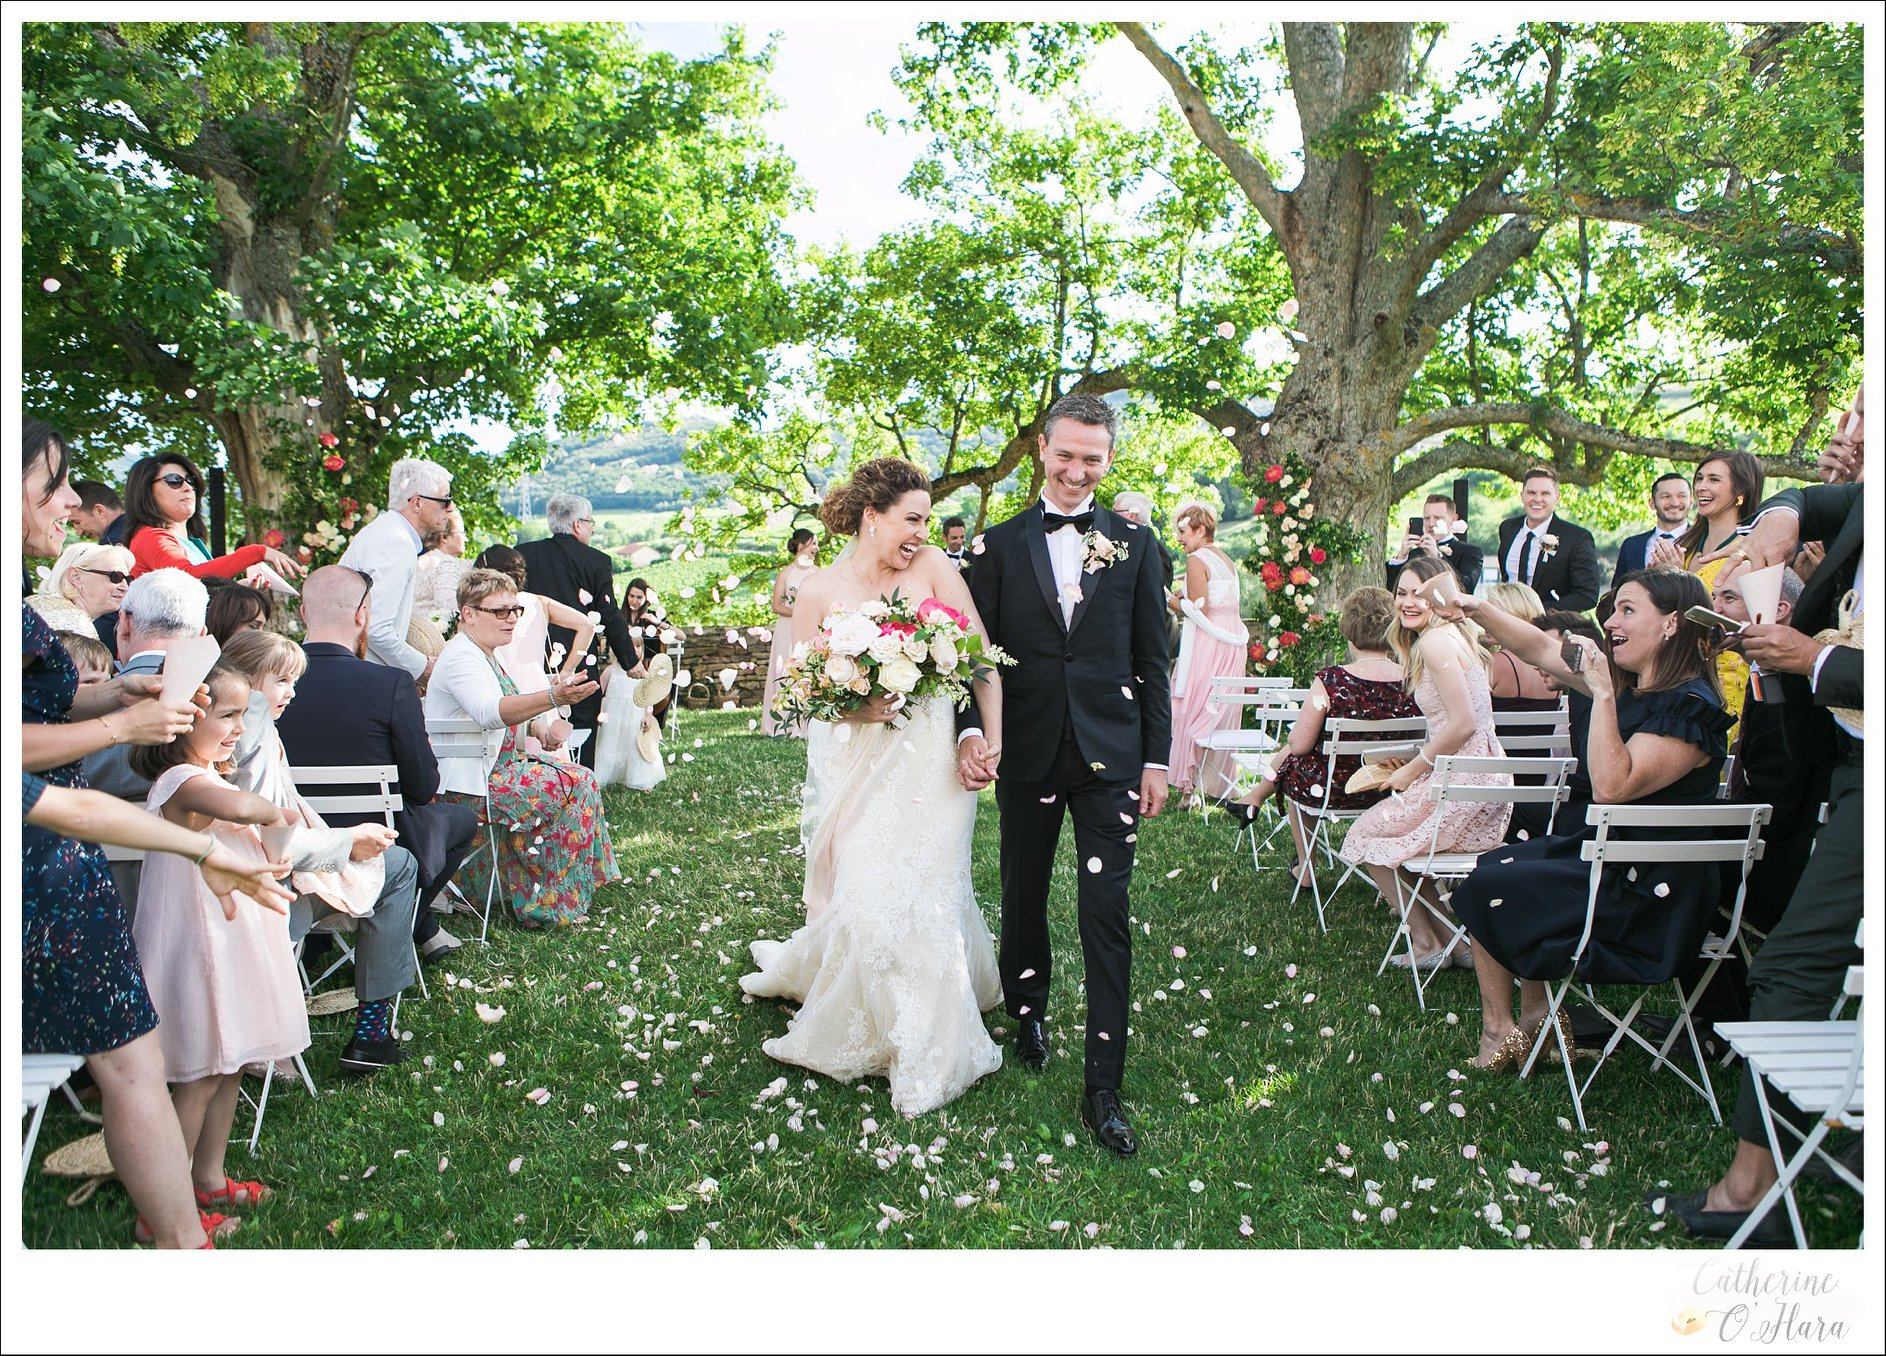 paris france english speaking elopement wedding photographer.jpg.jpg